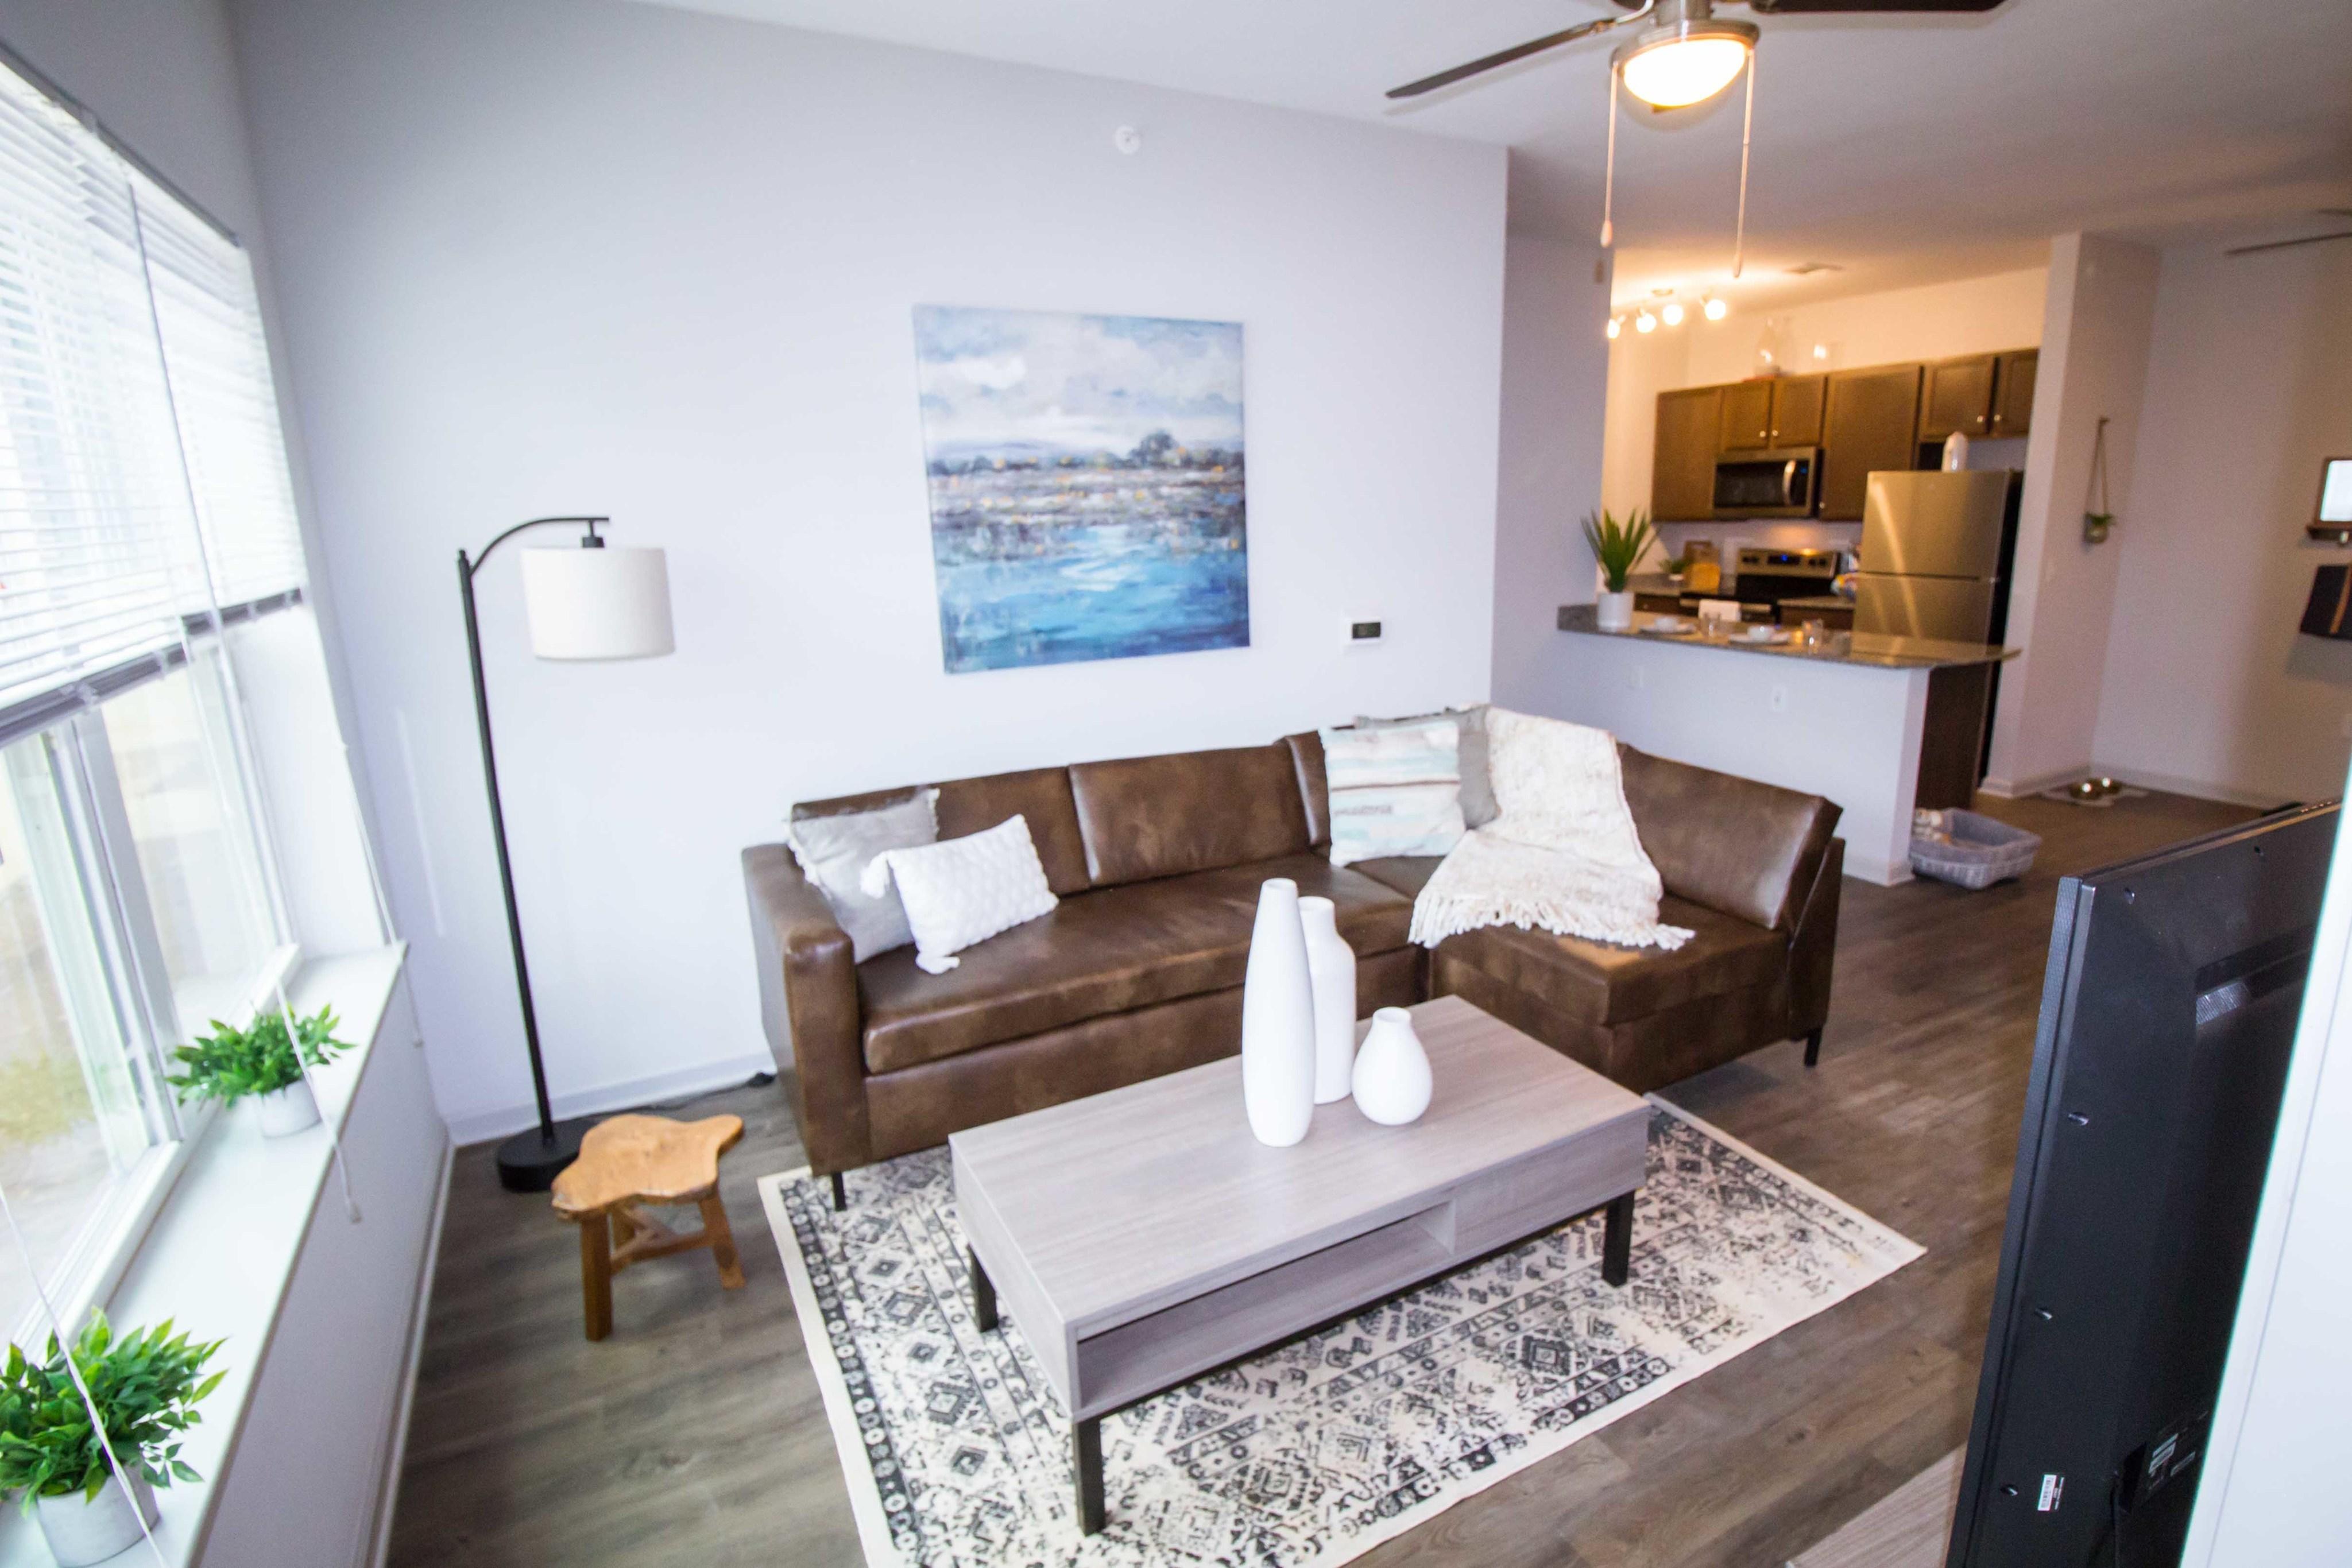 Elegant Living Room | Apartments for rent in Florence, AL | Bellamy Florence